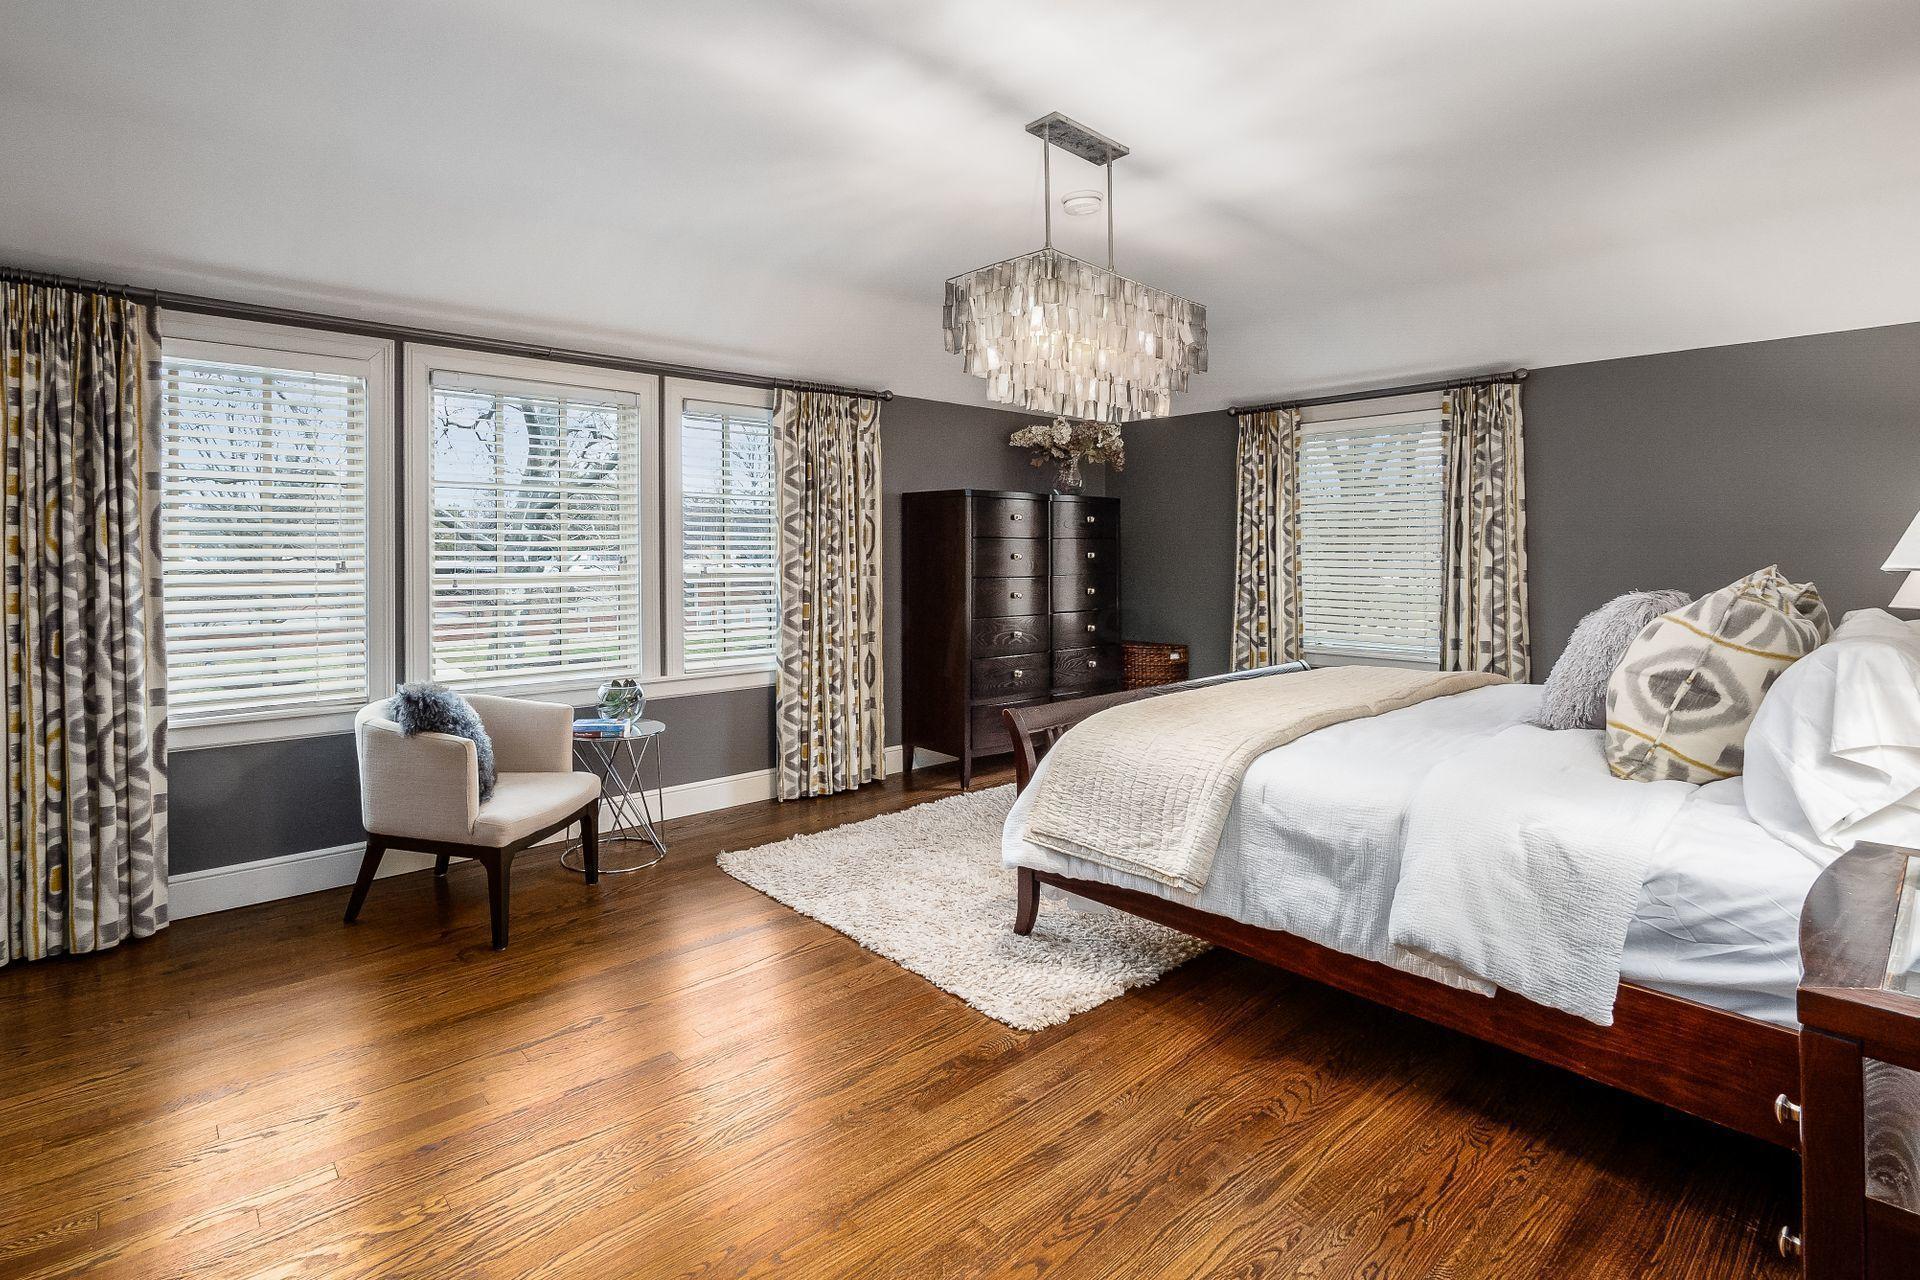 1751 Barrington Road, Upper Arlington, Ohio 43221, 3 Bedrooms Bedrooms, ,3 BathroomsBathrooms,Residential,For Sale,Barrington,221000624